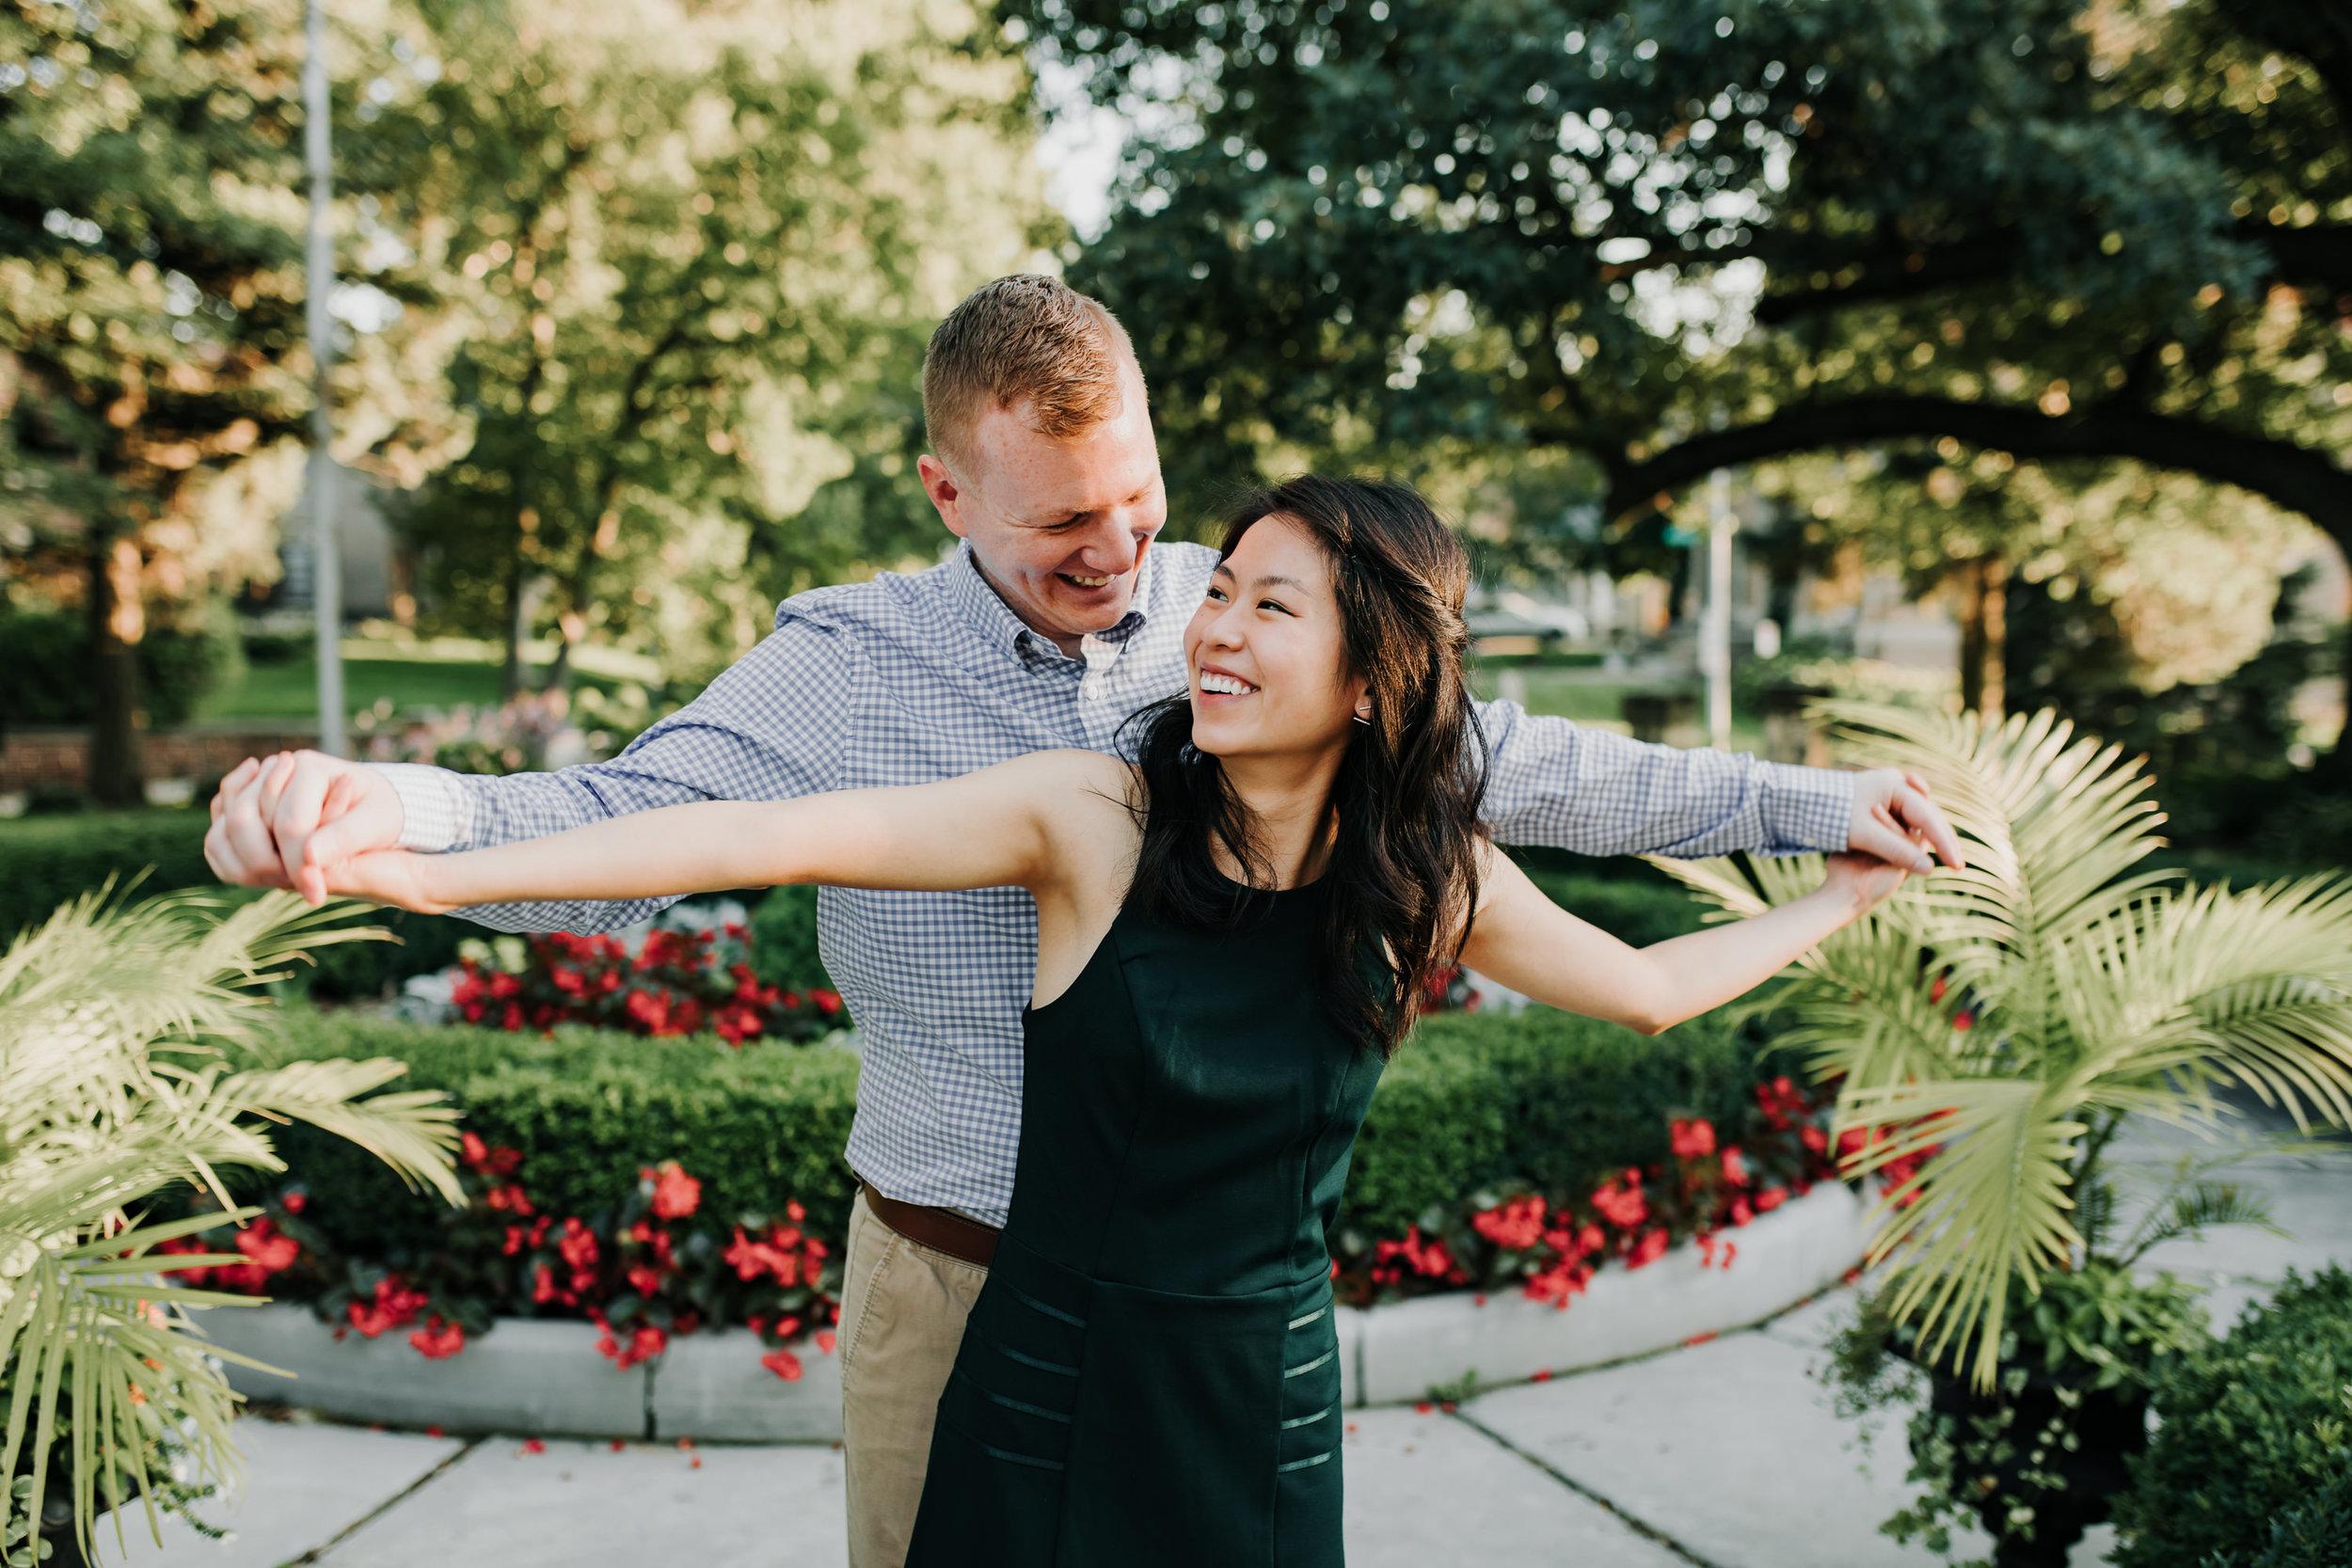 Catherin & Kyle - Married - Nathaniel Jensen Photography - Omaha Nebraska Wedding Photograper - Memorial Park - Joslyn Castle Engagement Session-46.jpg